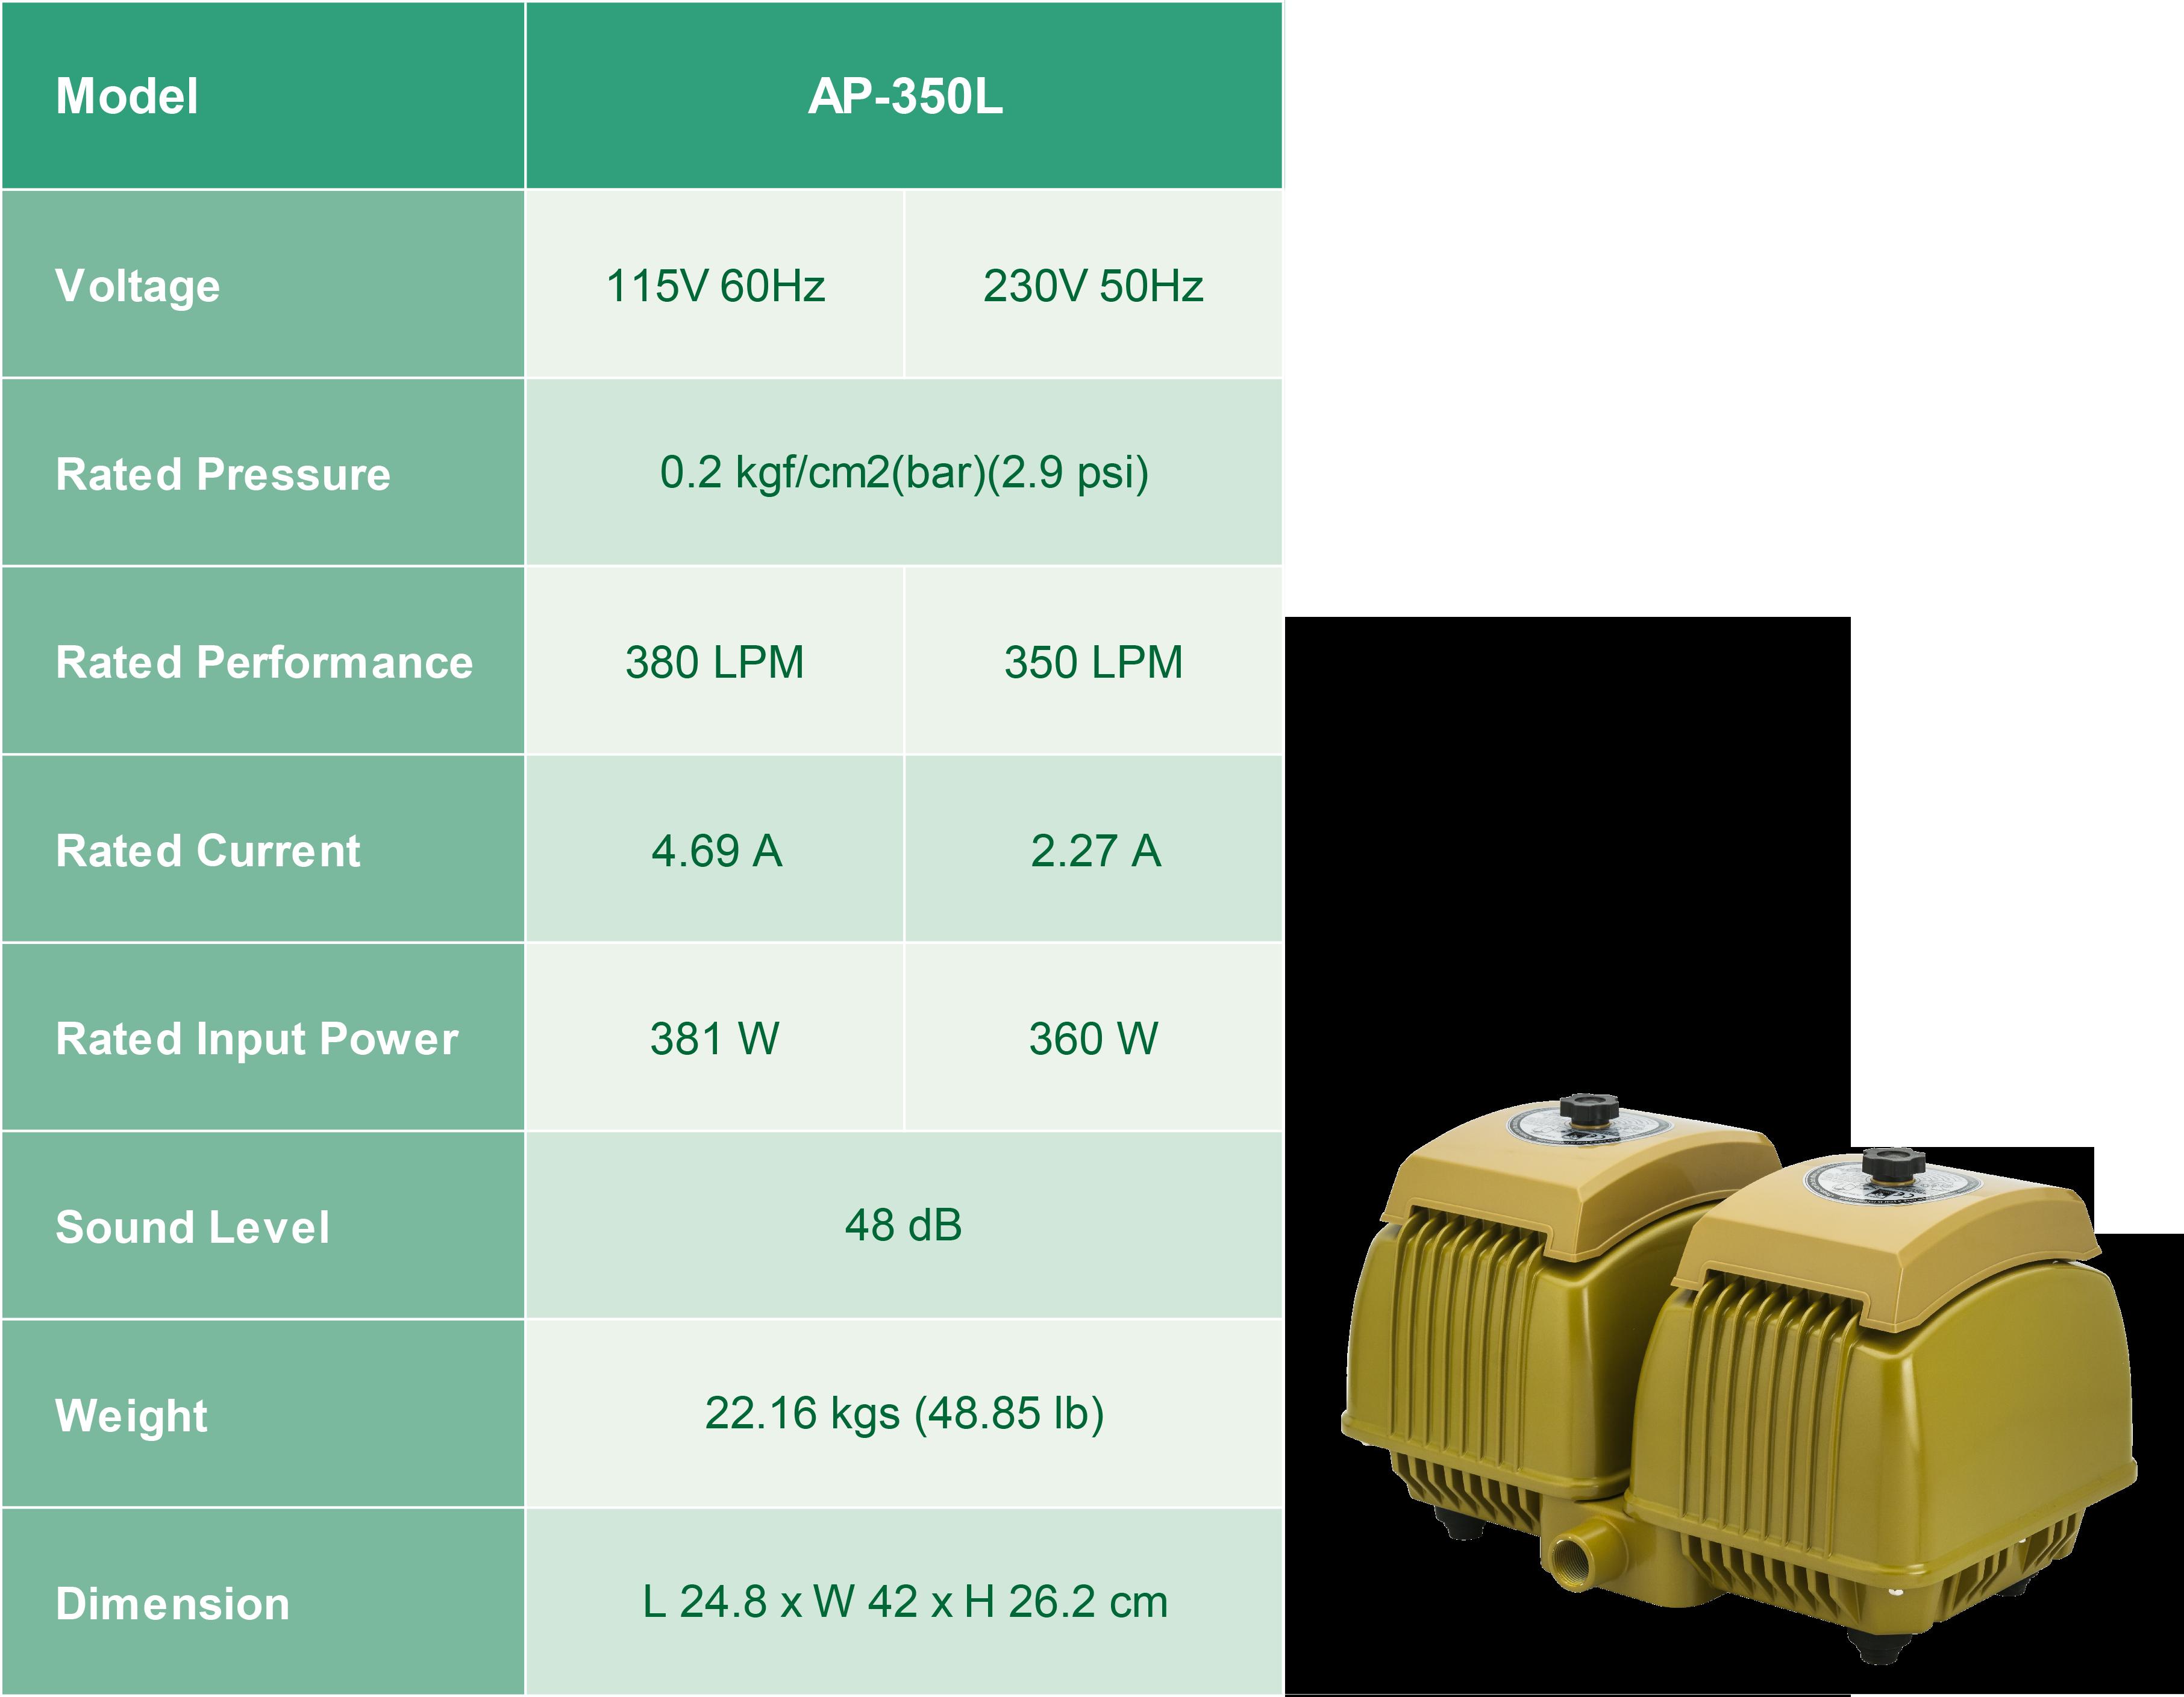 Linear Air Pumps AP-350L Performance